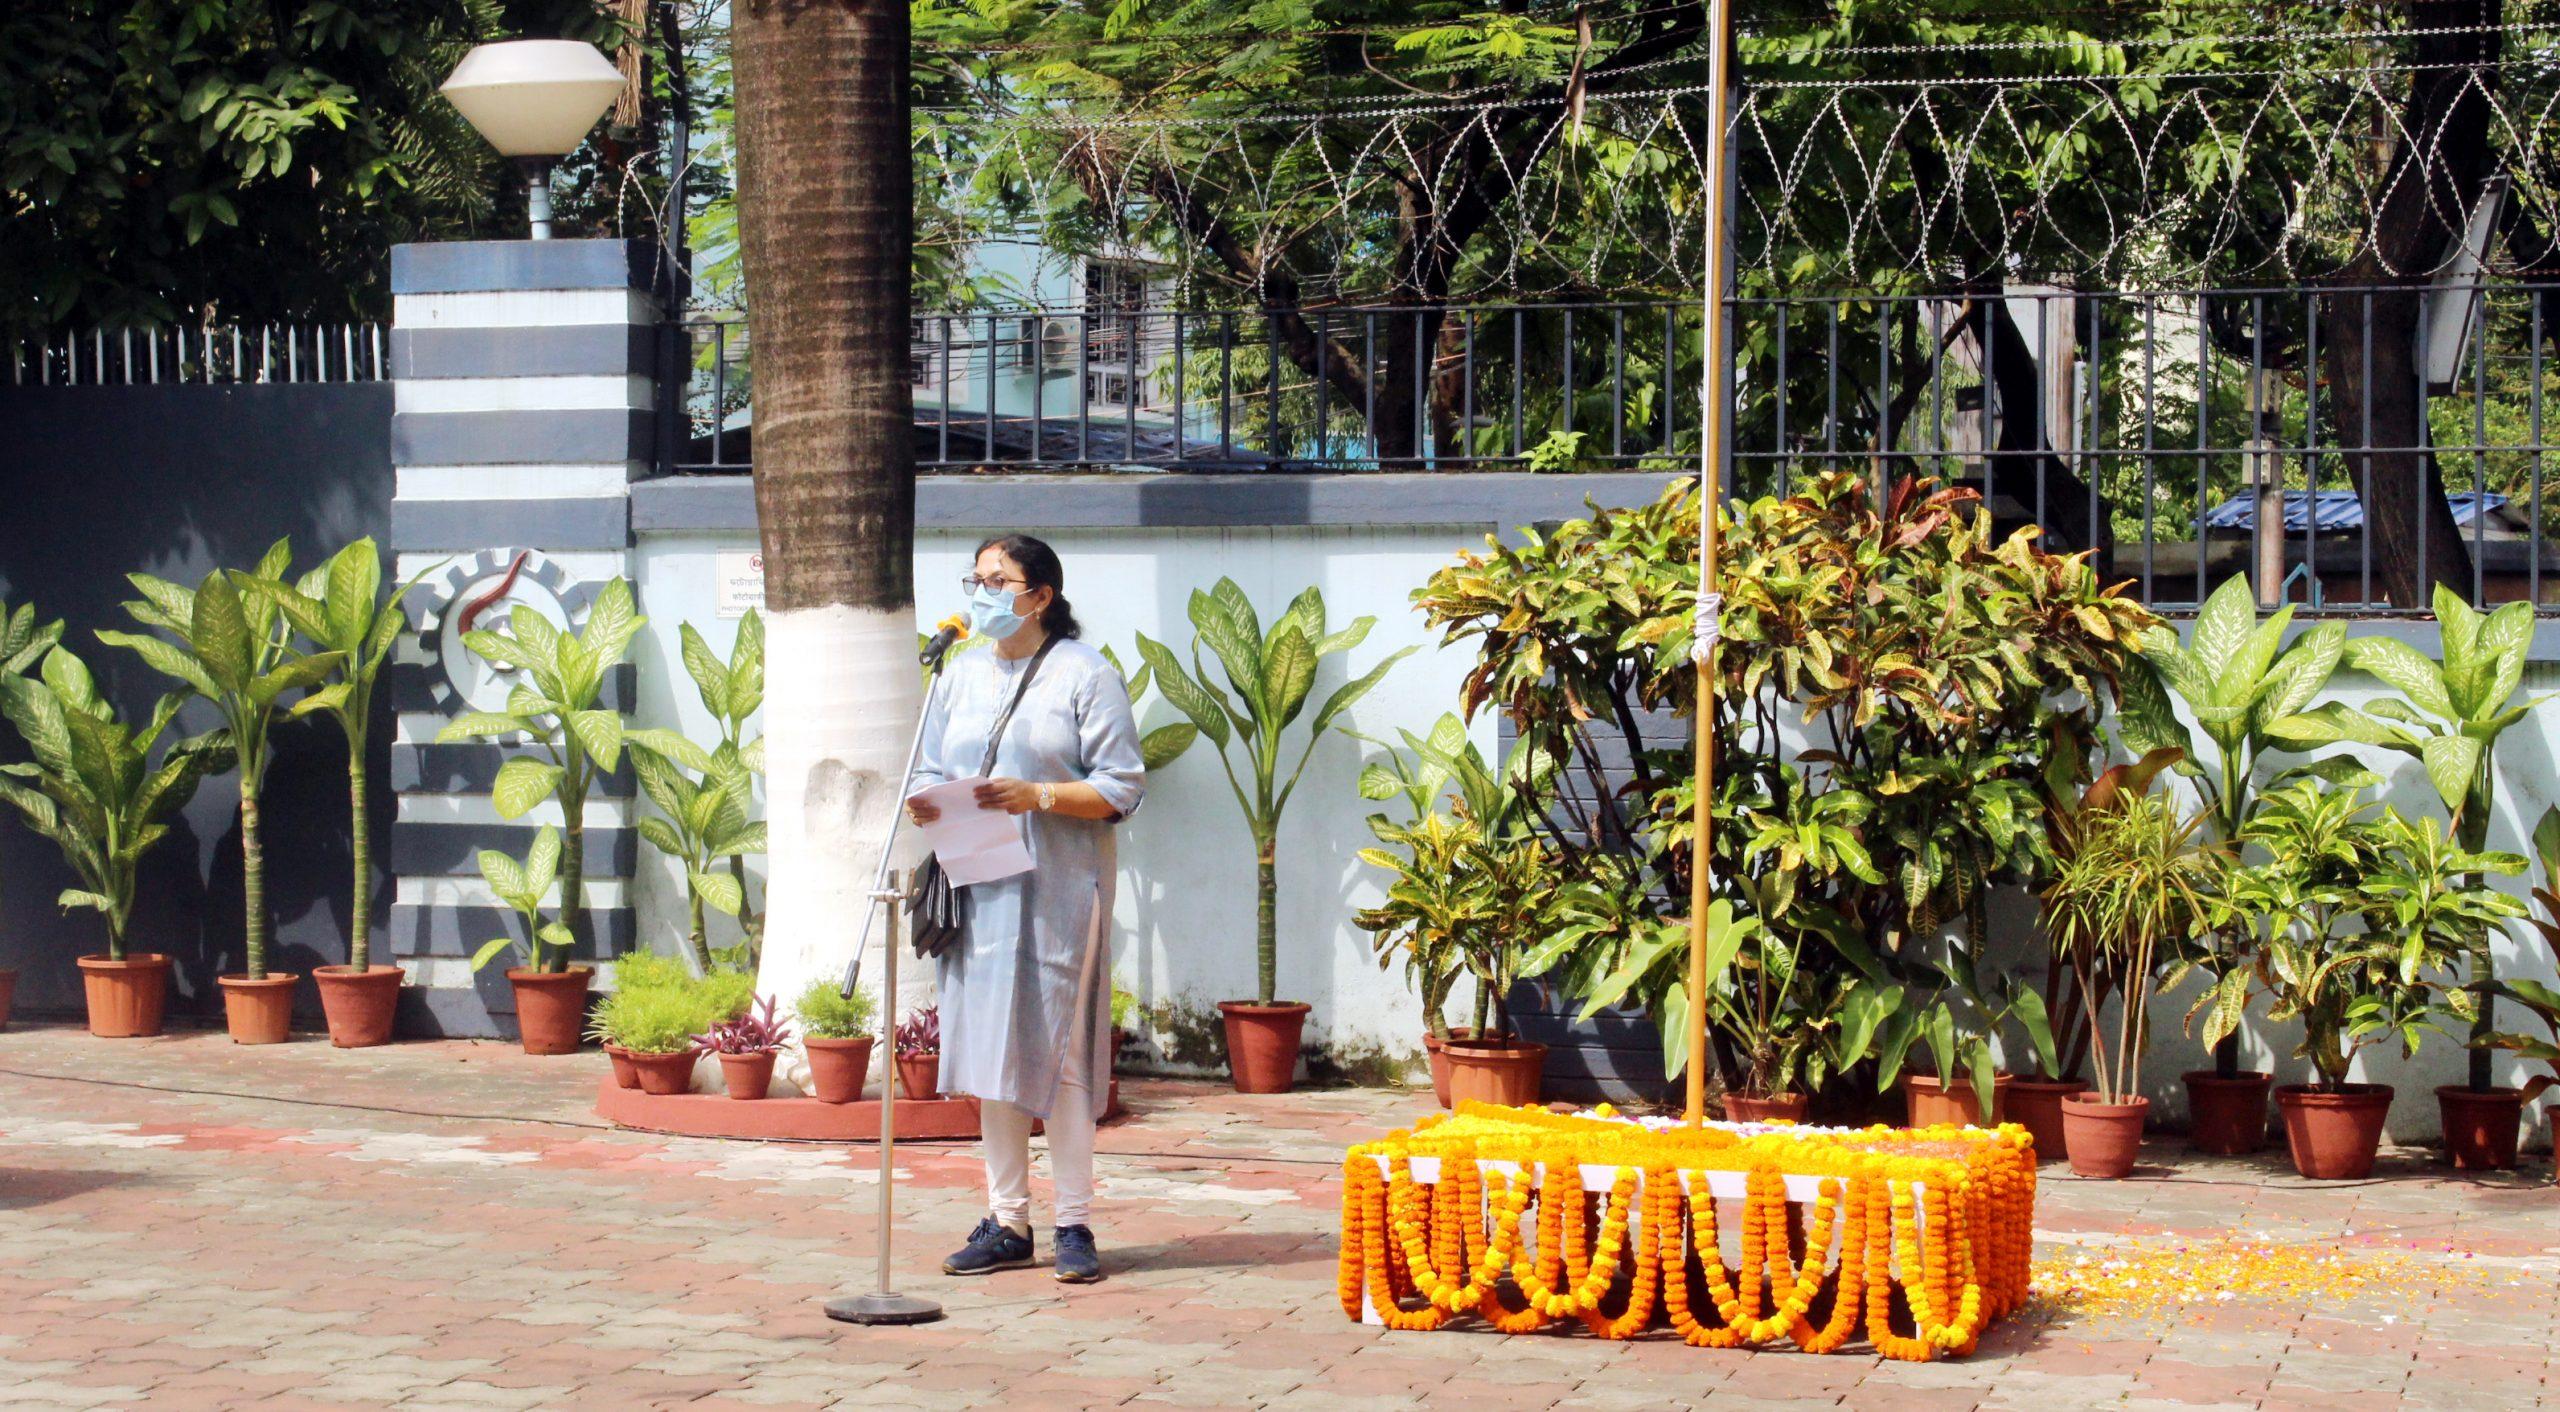 Independence Day Address by Director, CSIR-CGCRI